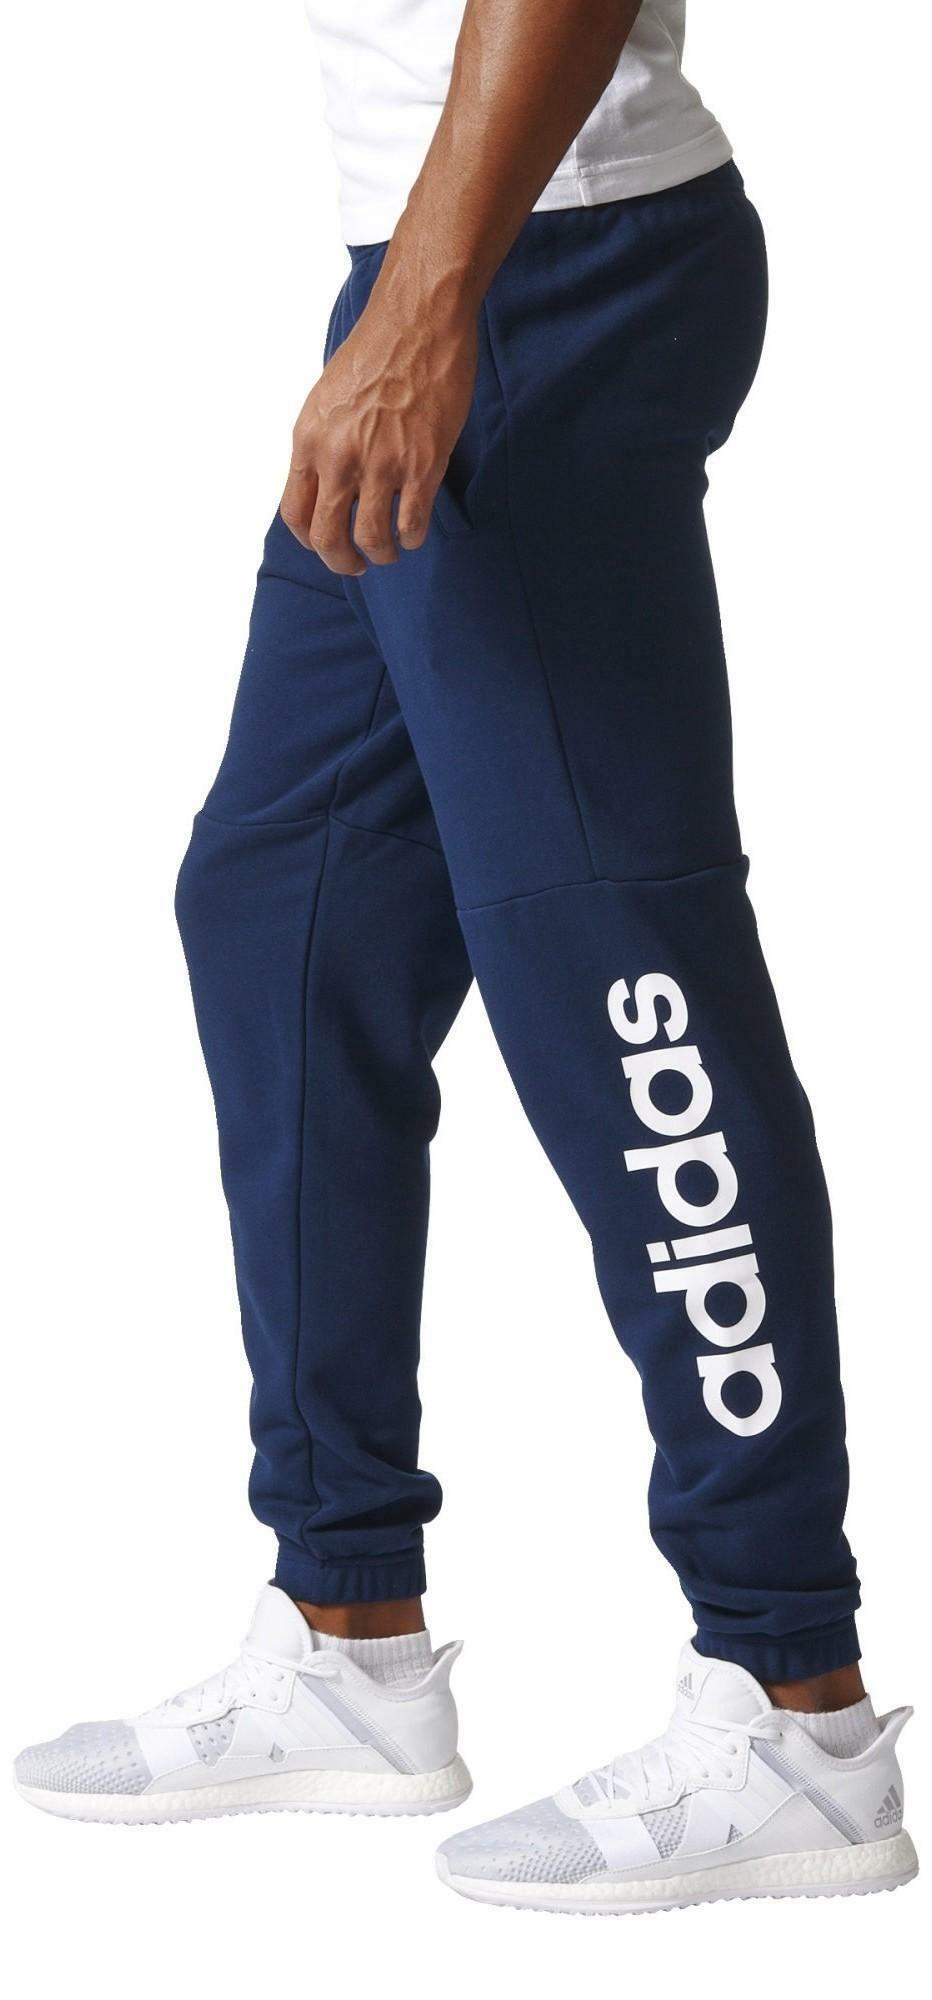 adidas adidas pantaloni uomo cotone garzato blu bq9089